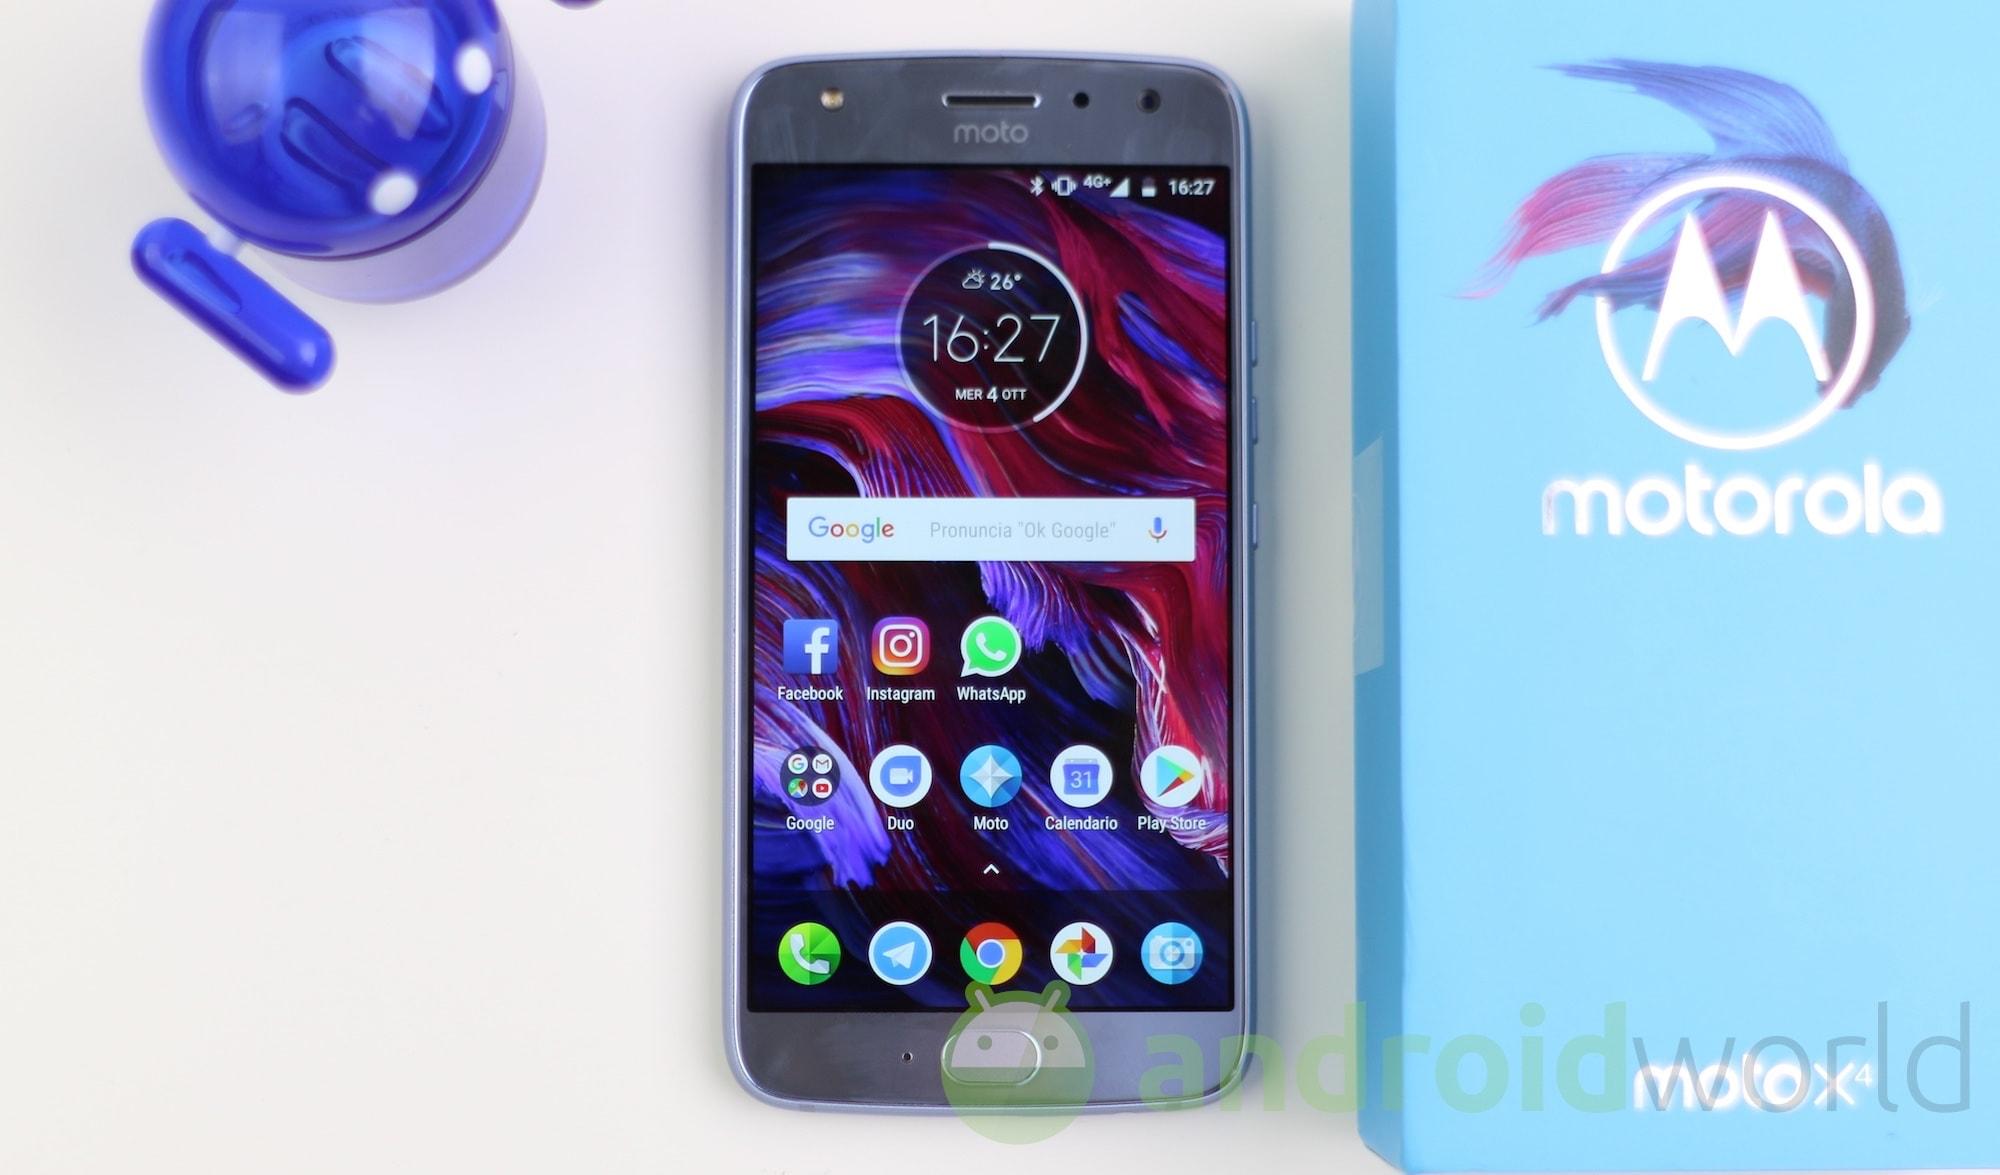 Motorola Moto X4 def – 1